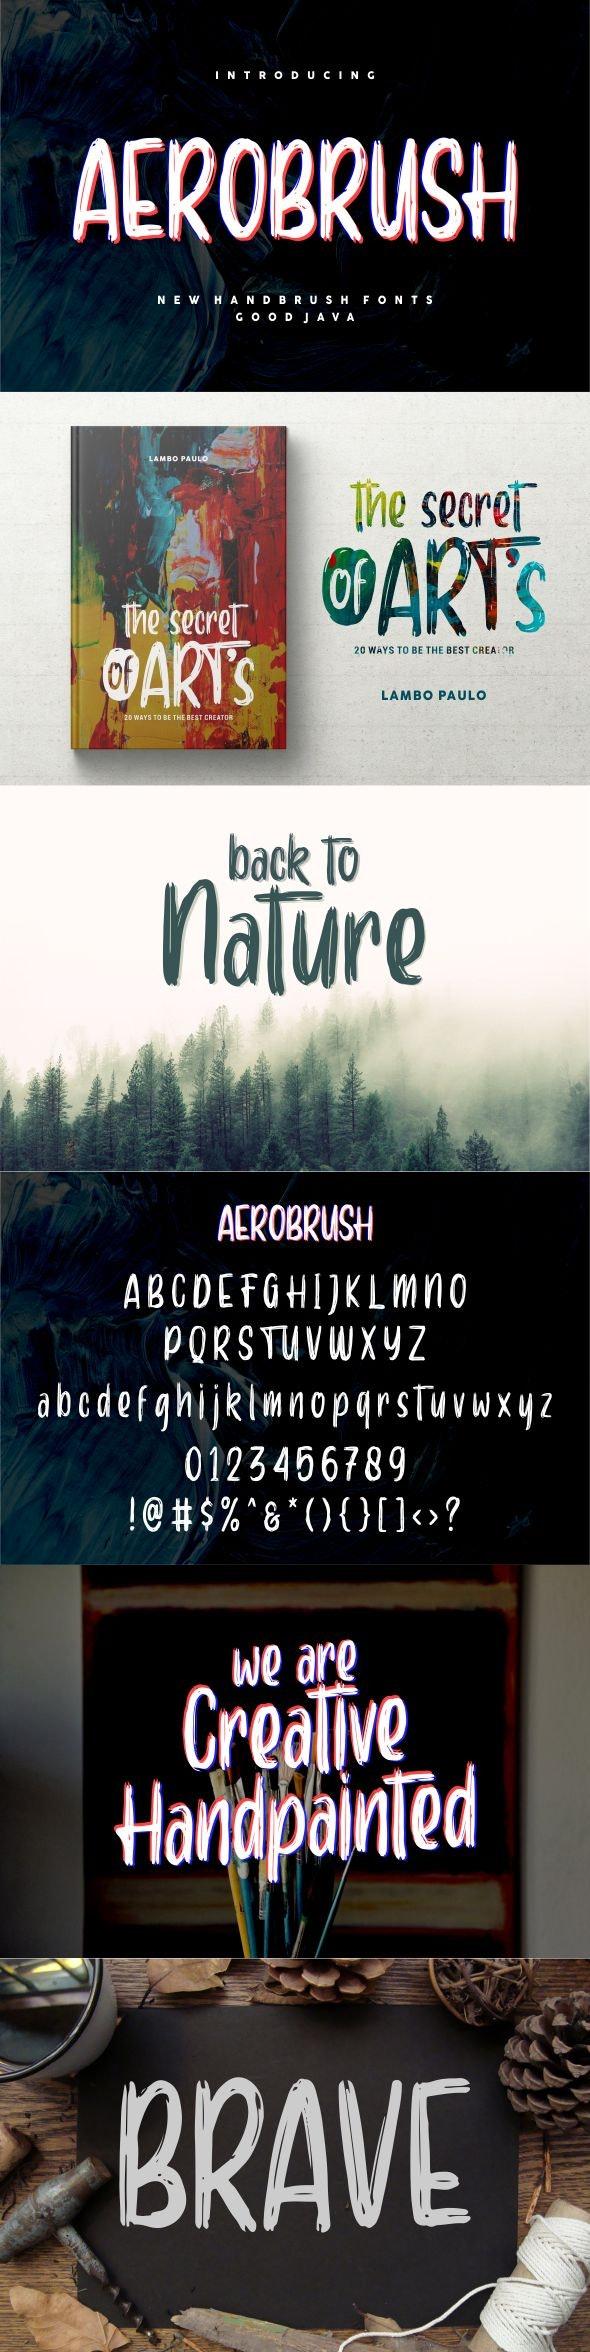 Aerobrush - Handwriting Fonts